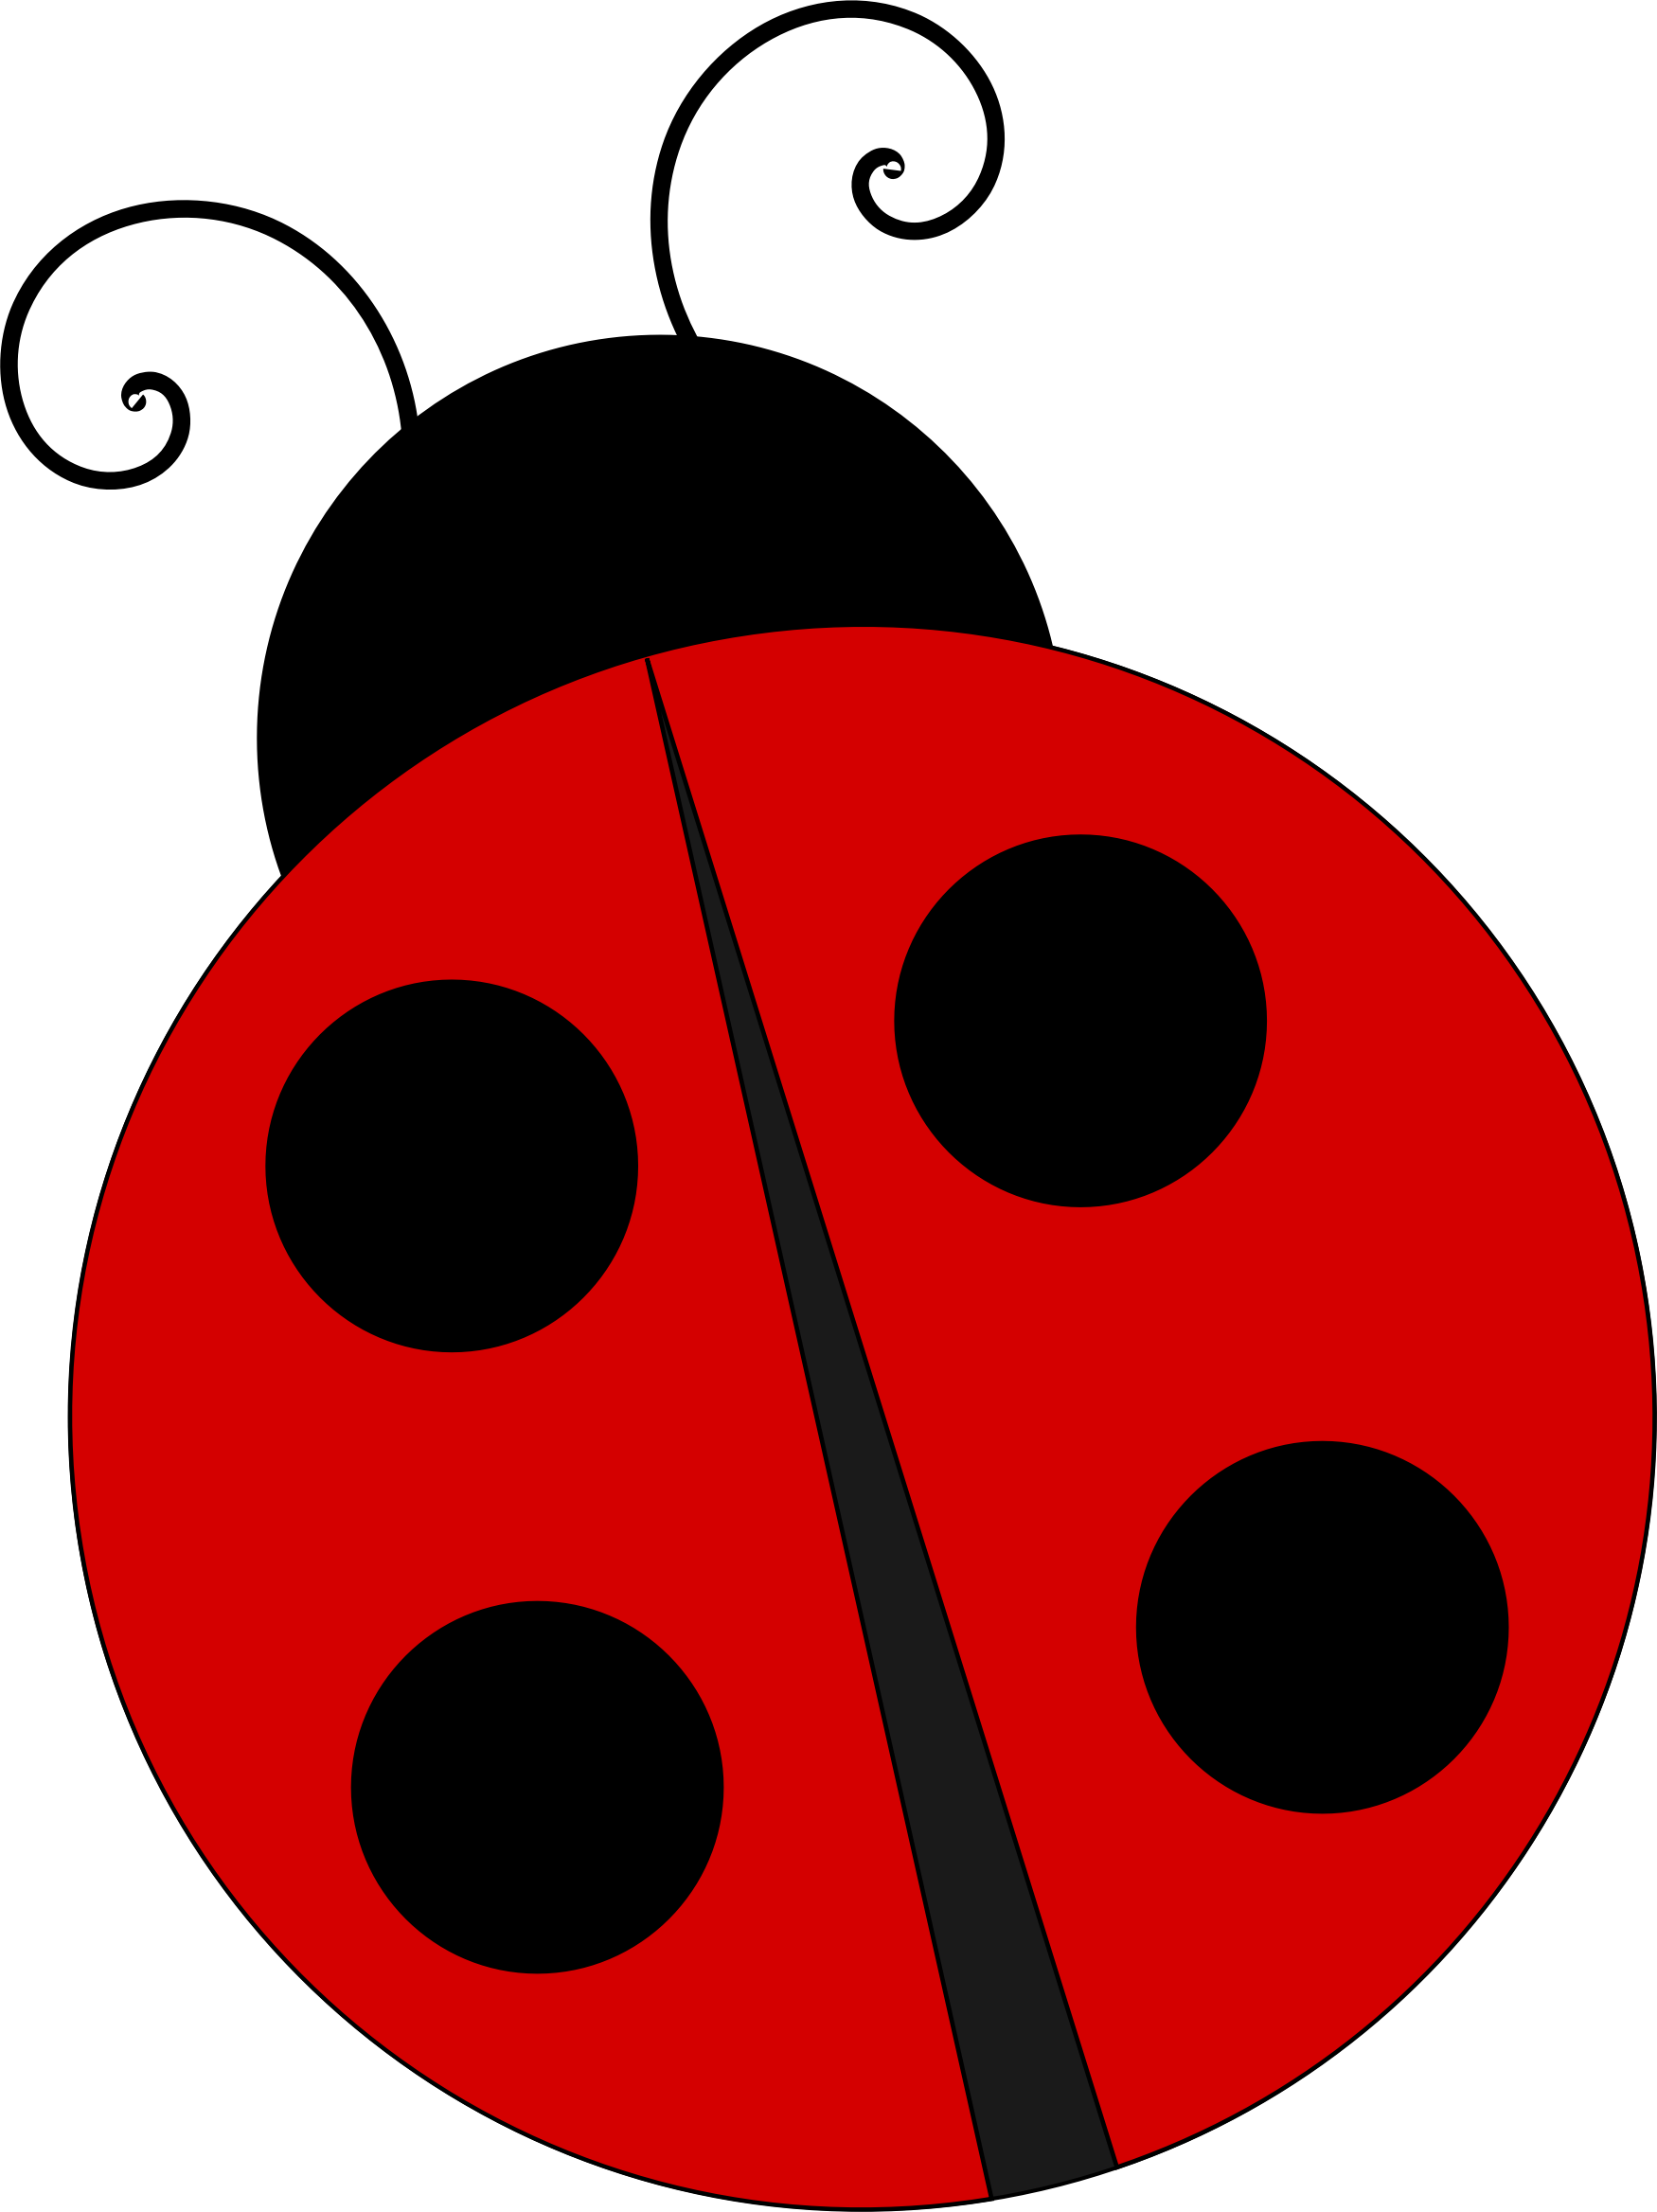 clipart ladybug rh openclipart org Butterfly Clip Art Ladybug Girl Clip Art